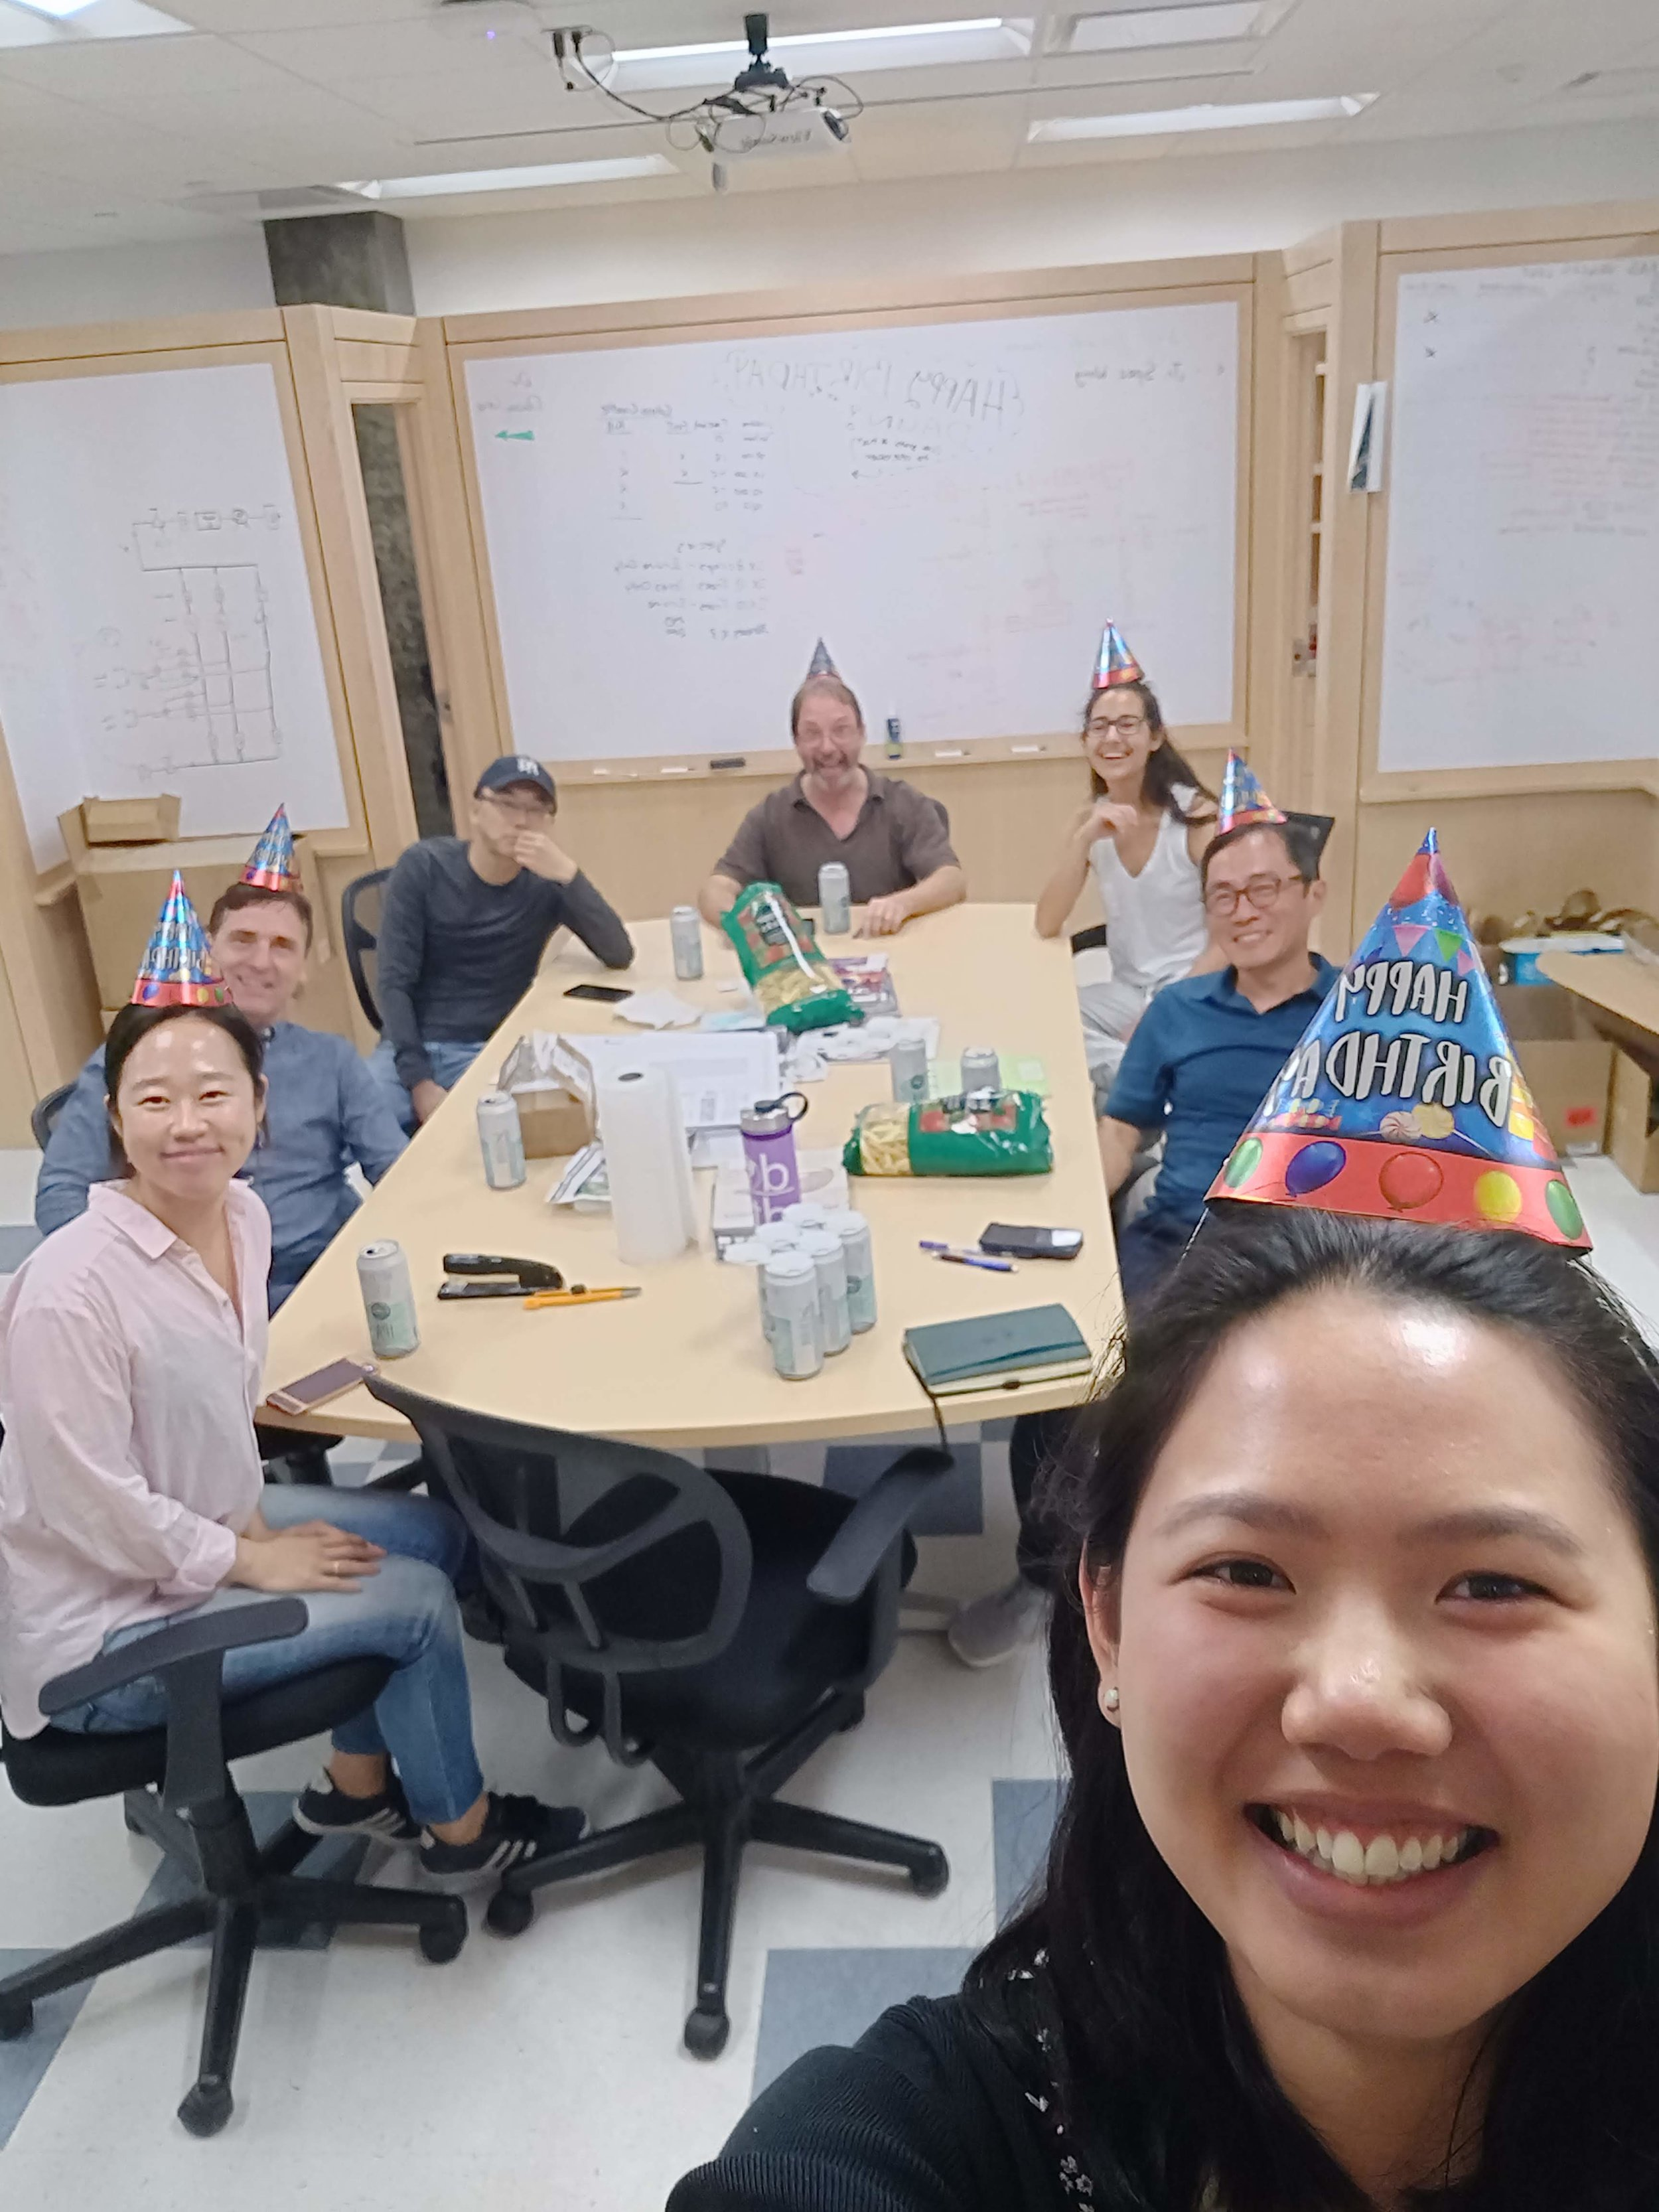 Birthday meeting!